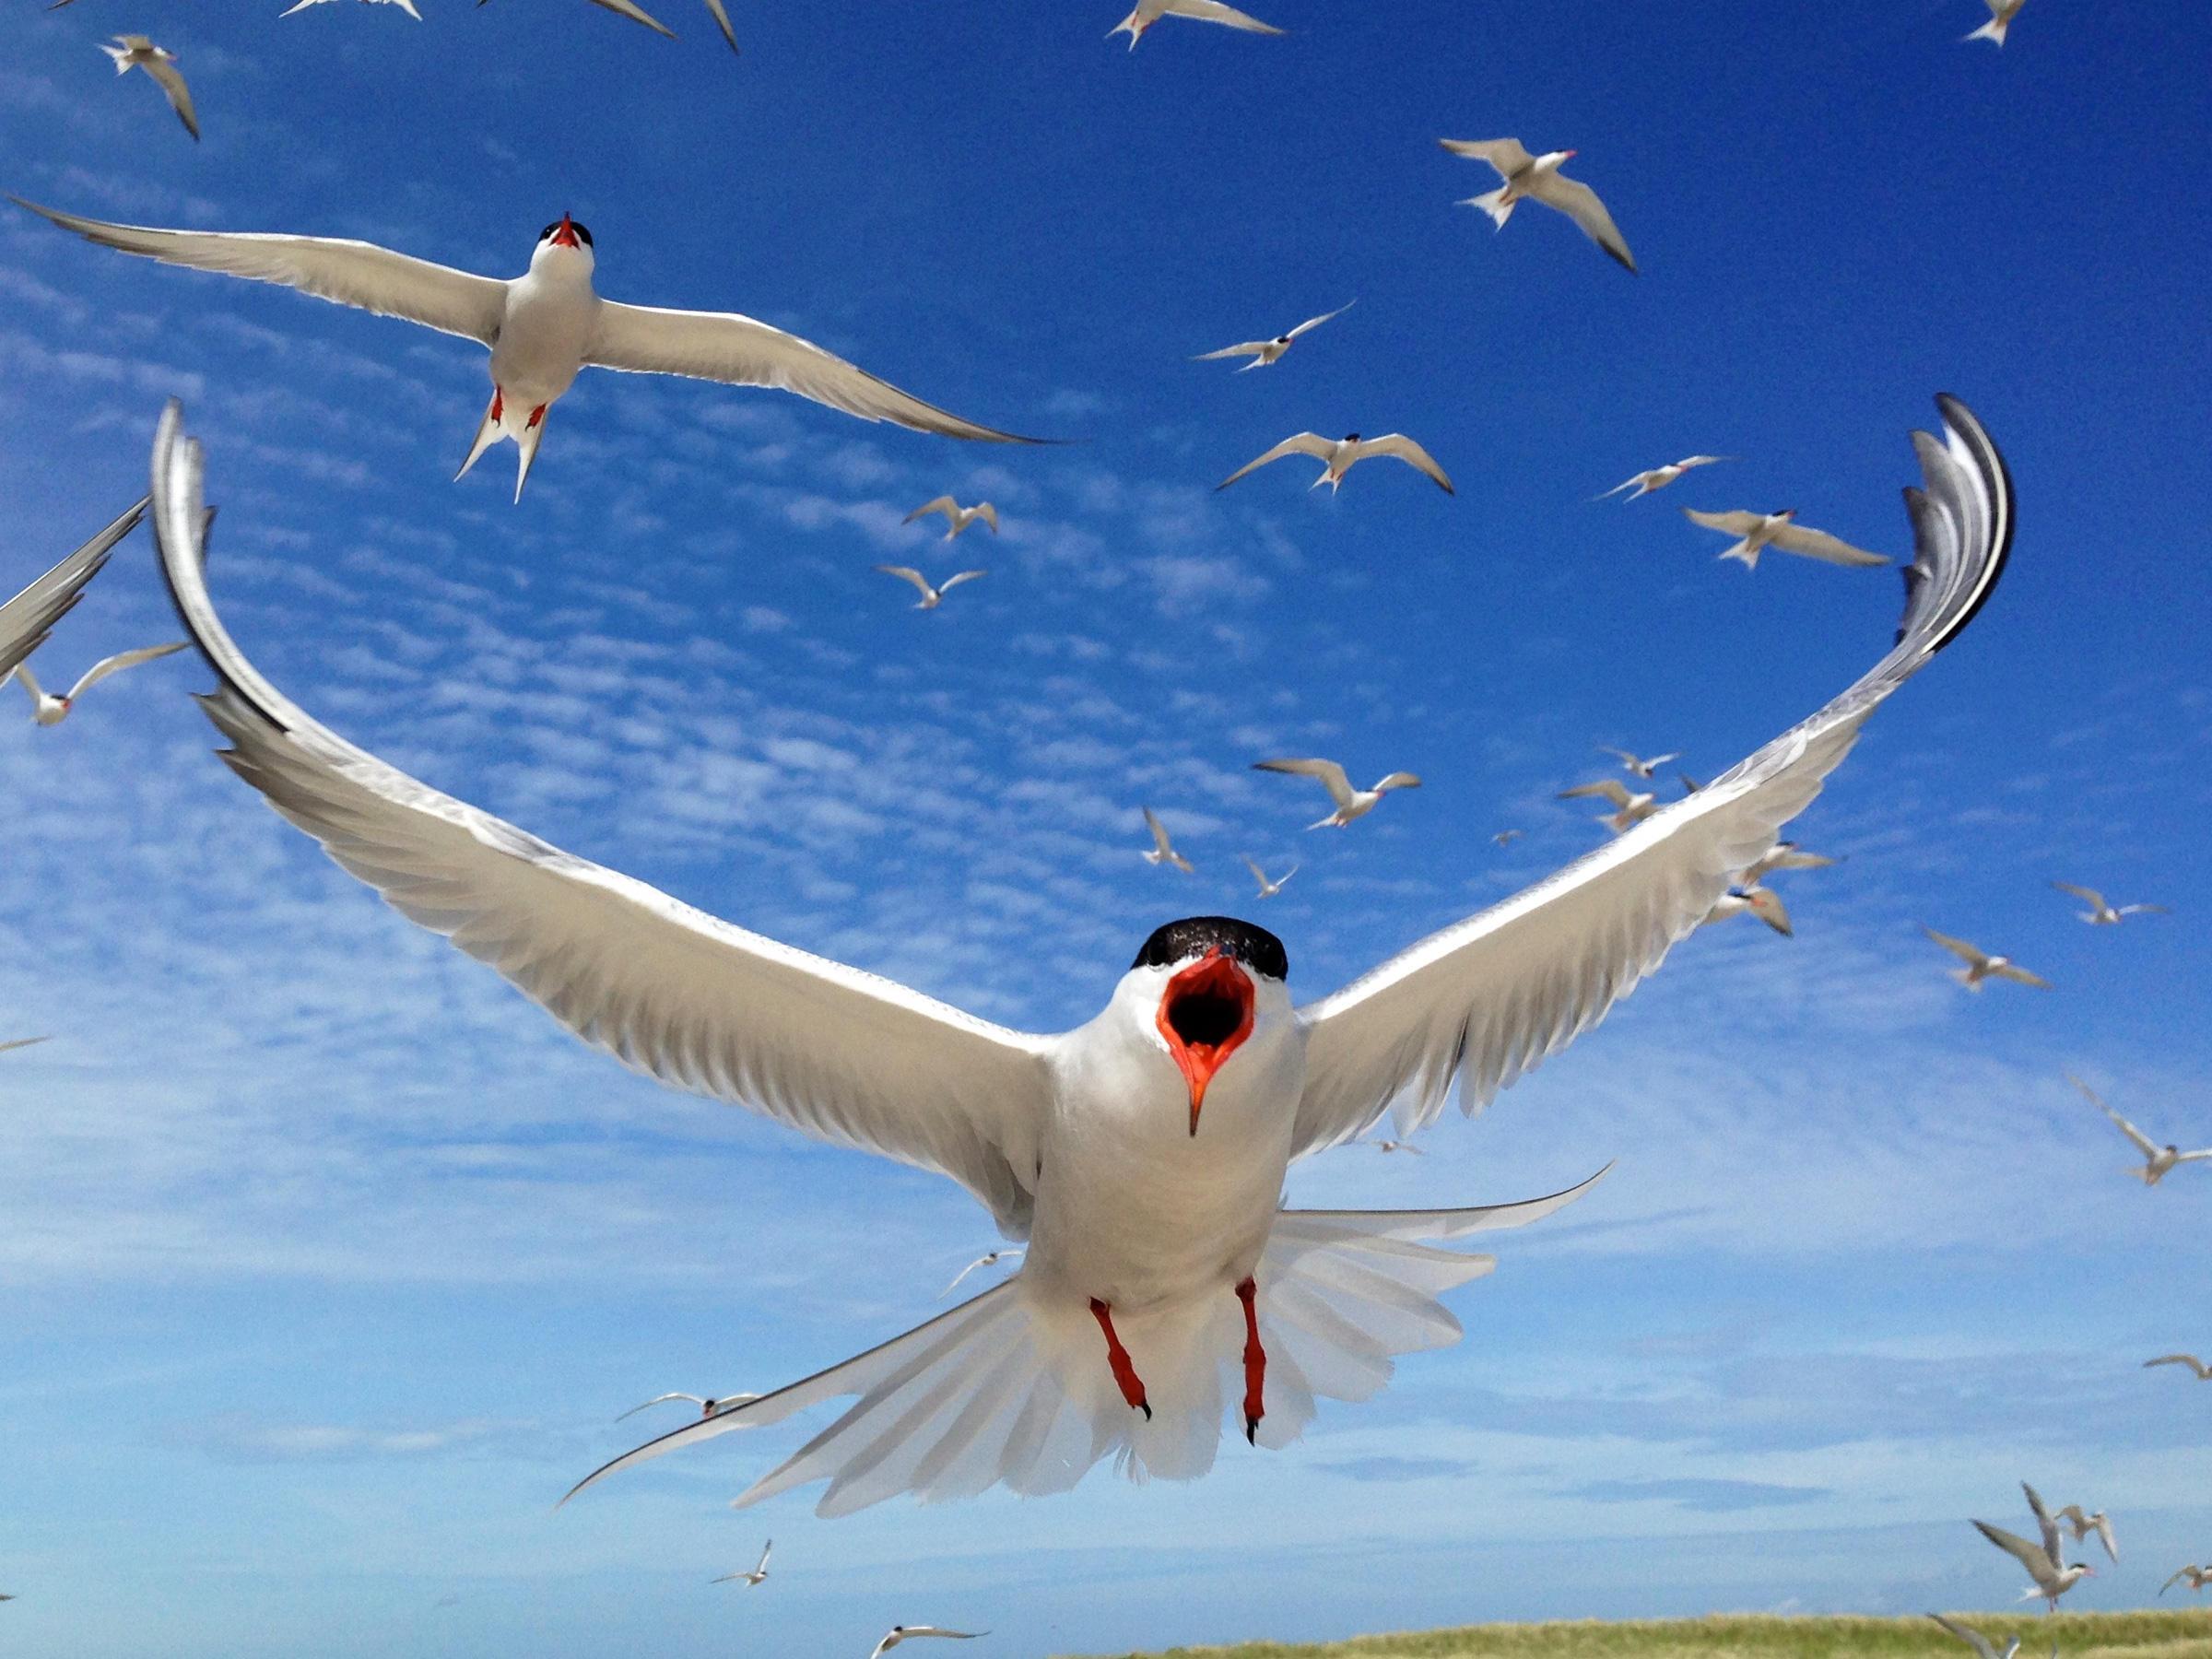 Common Terns, shot on an iPhone 5. Joseph Samela/Audubon Photography Awards